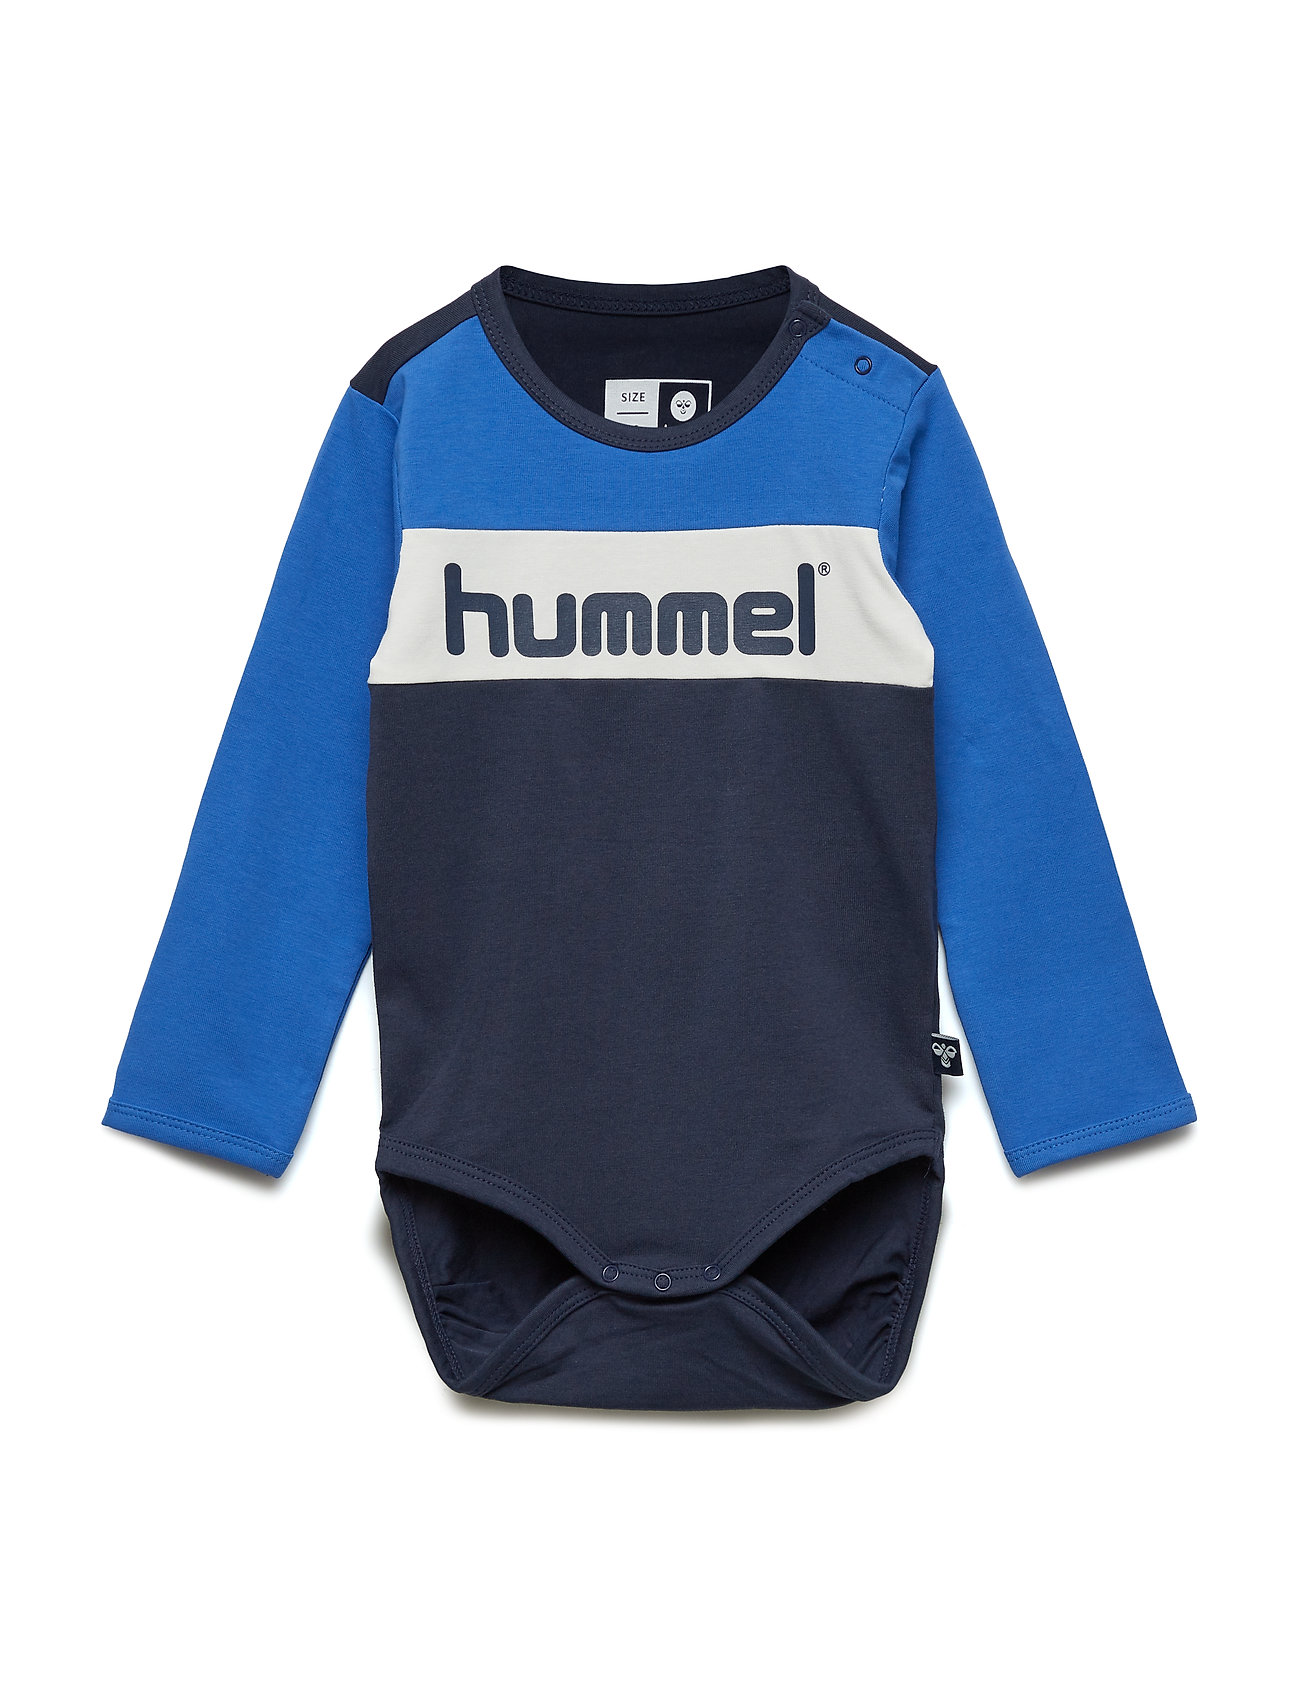 557bf8f54a8 Hmlclyde Body L/s (Black Iris) (12.97 €) - Hummel - | Boozt.com